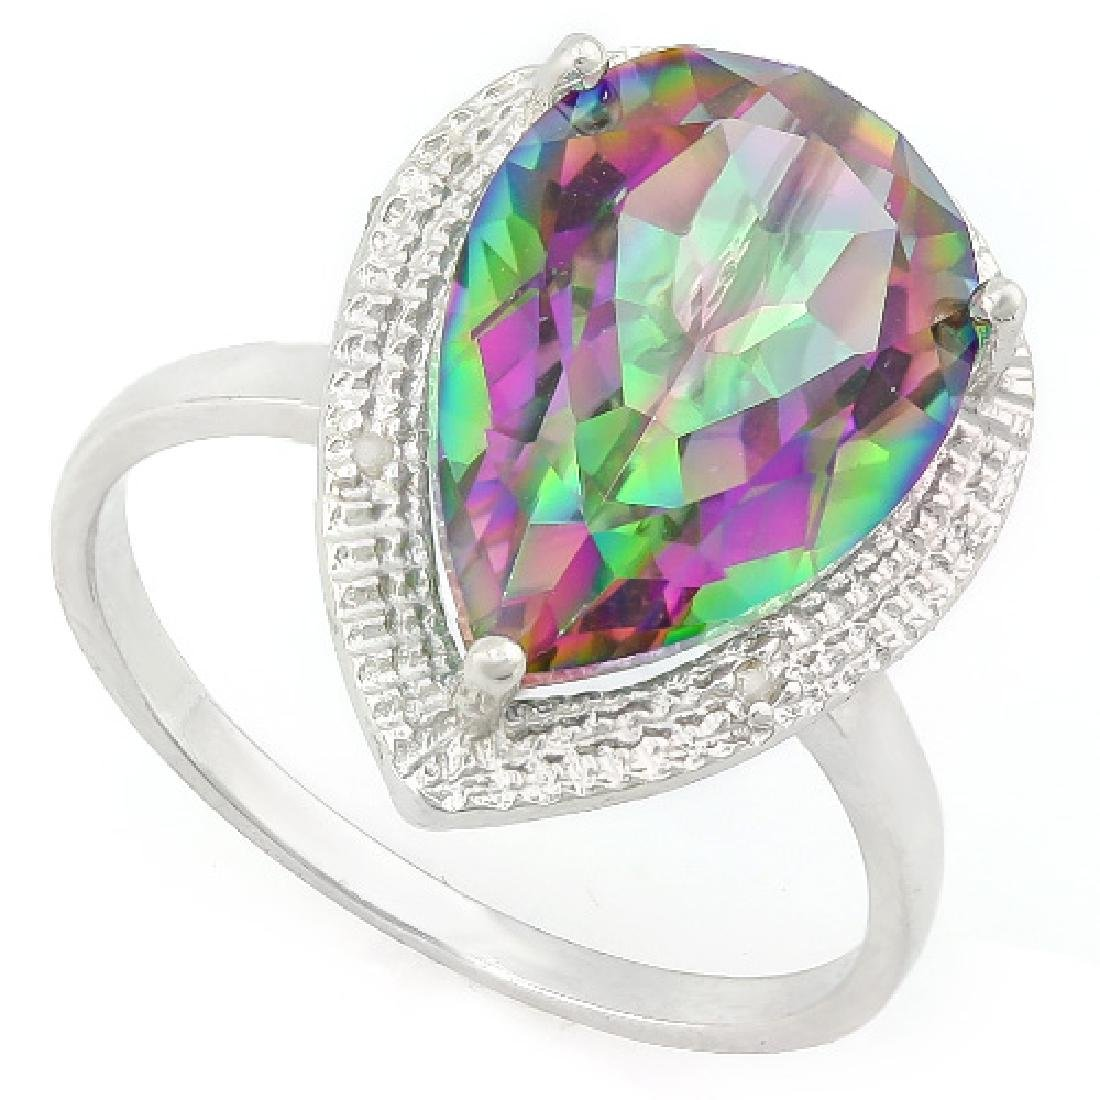 5 1/5 CARAT MYSTIC GEMSTONE & DIAMOND 925 STERLING SILV